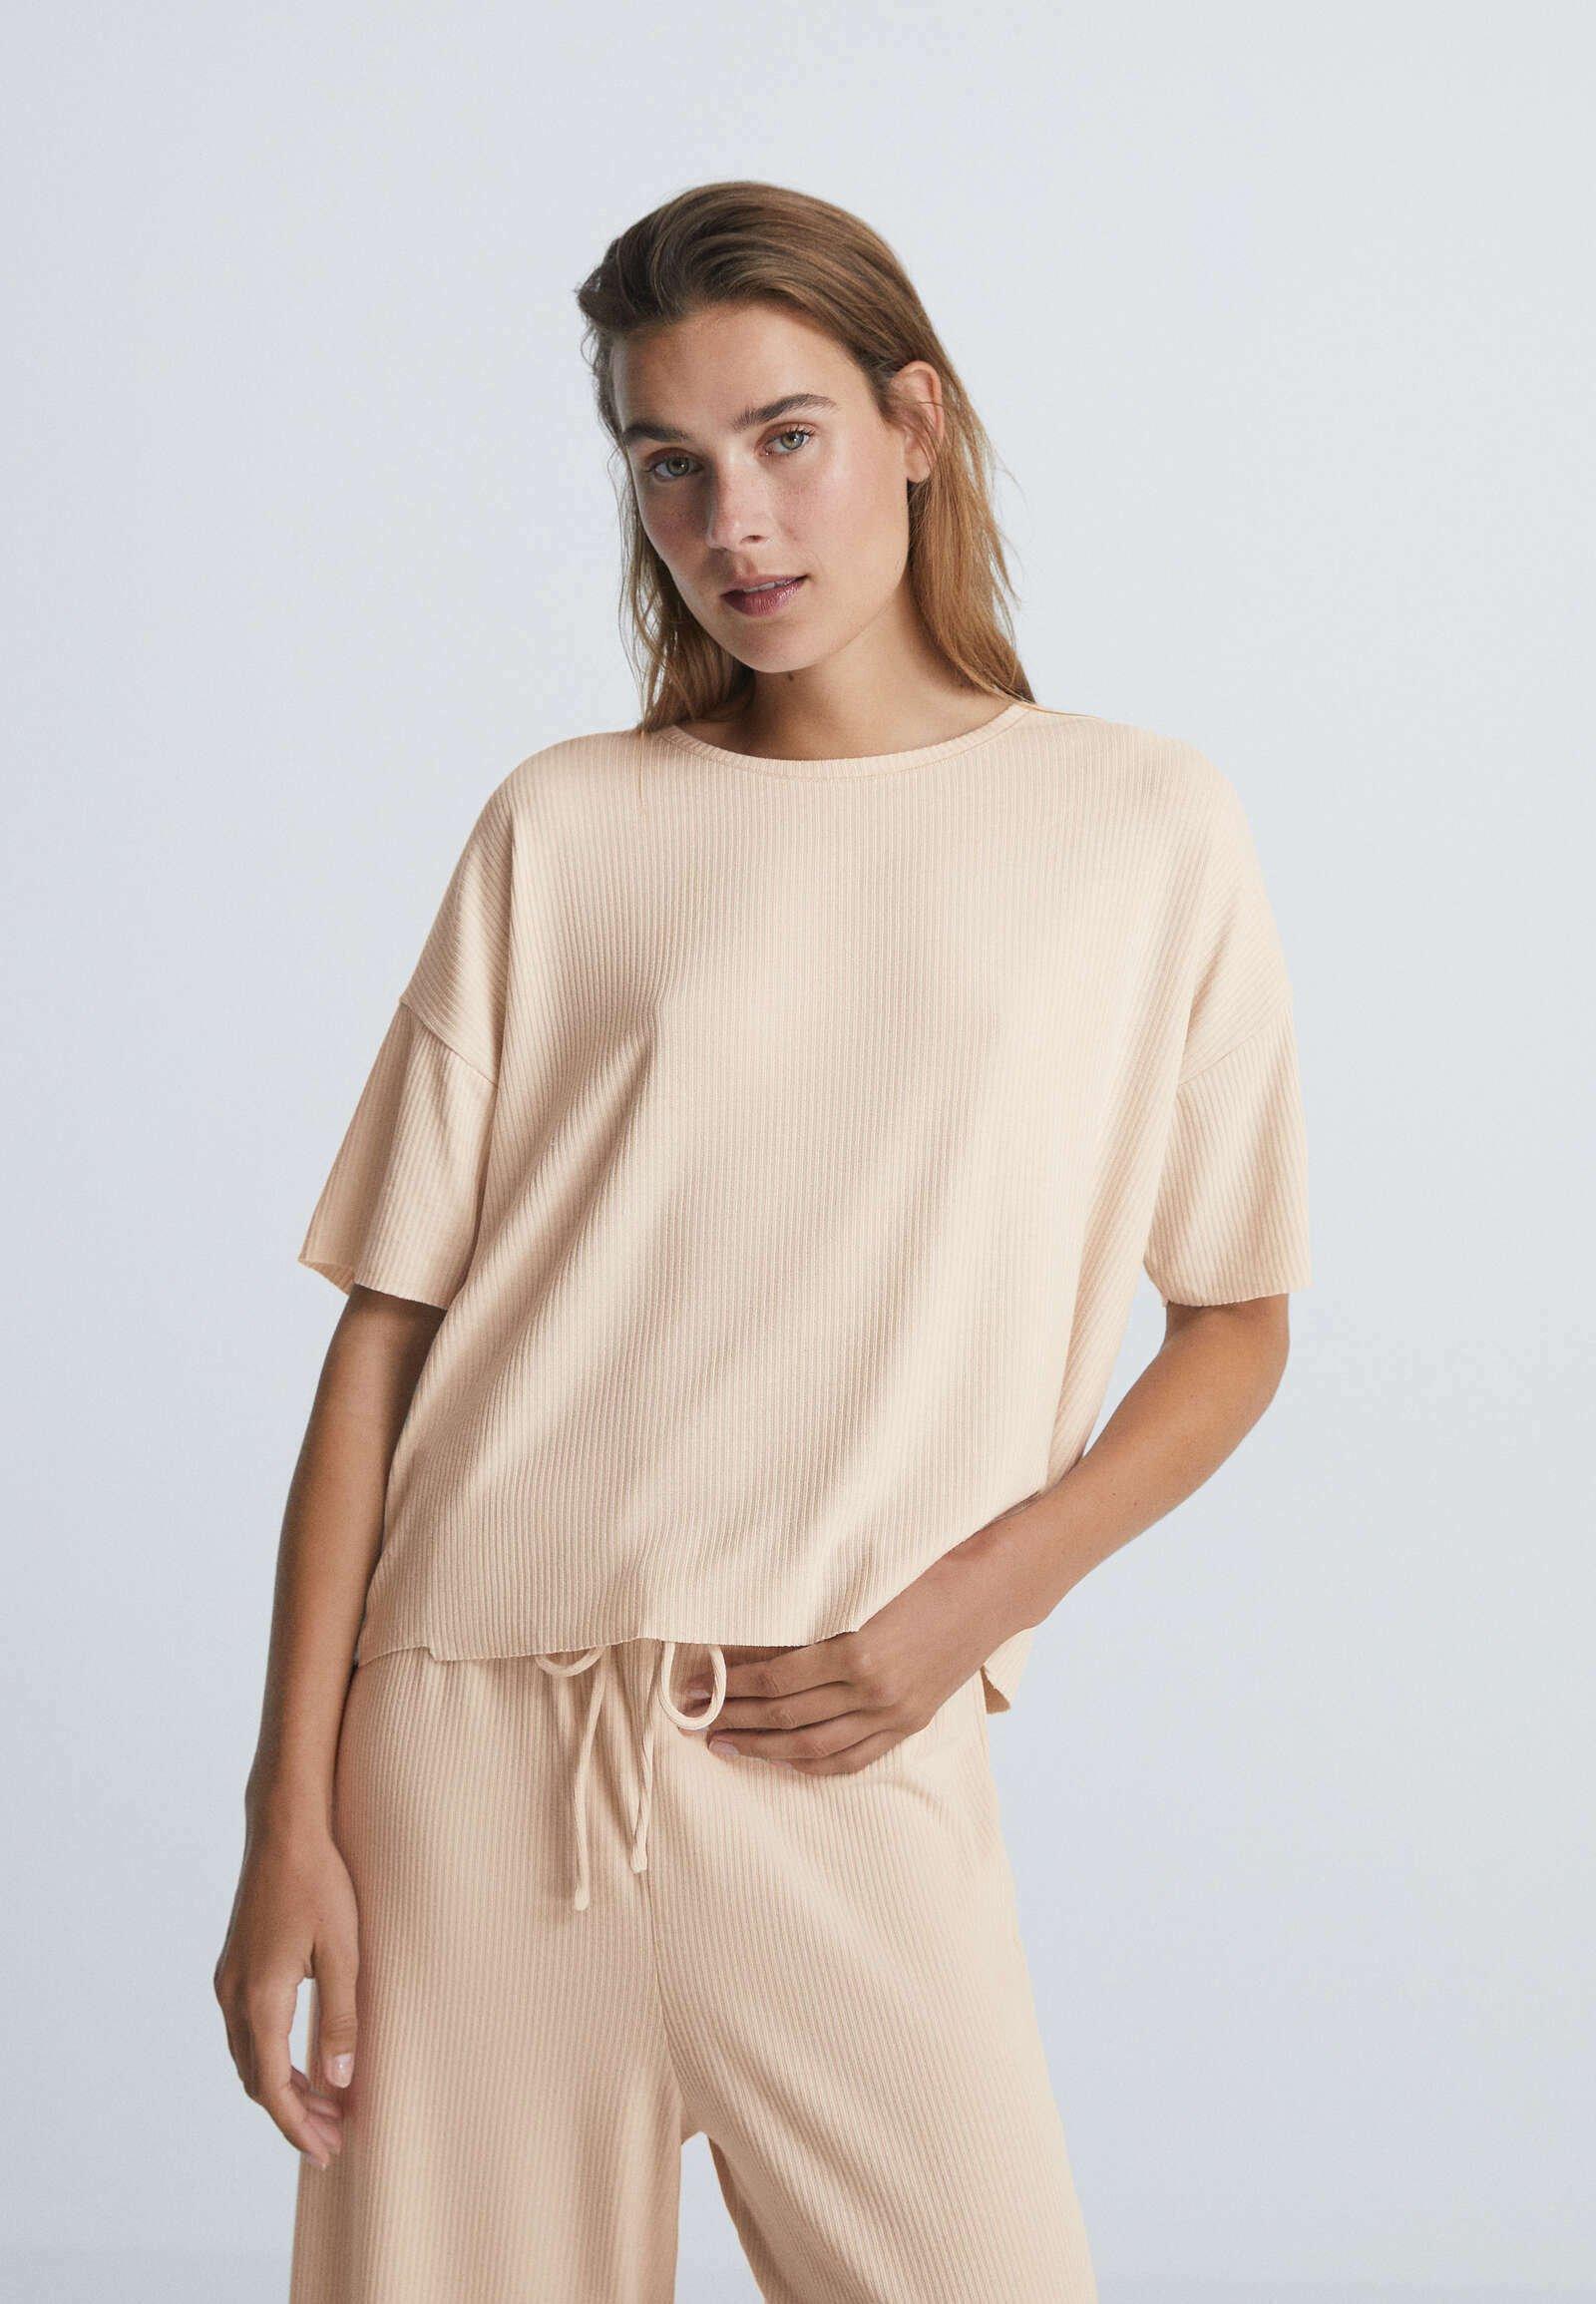 Damen SHORT SLEEVED - Nachtwäsche Shirt